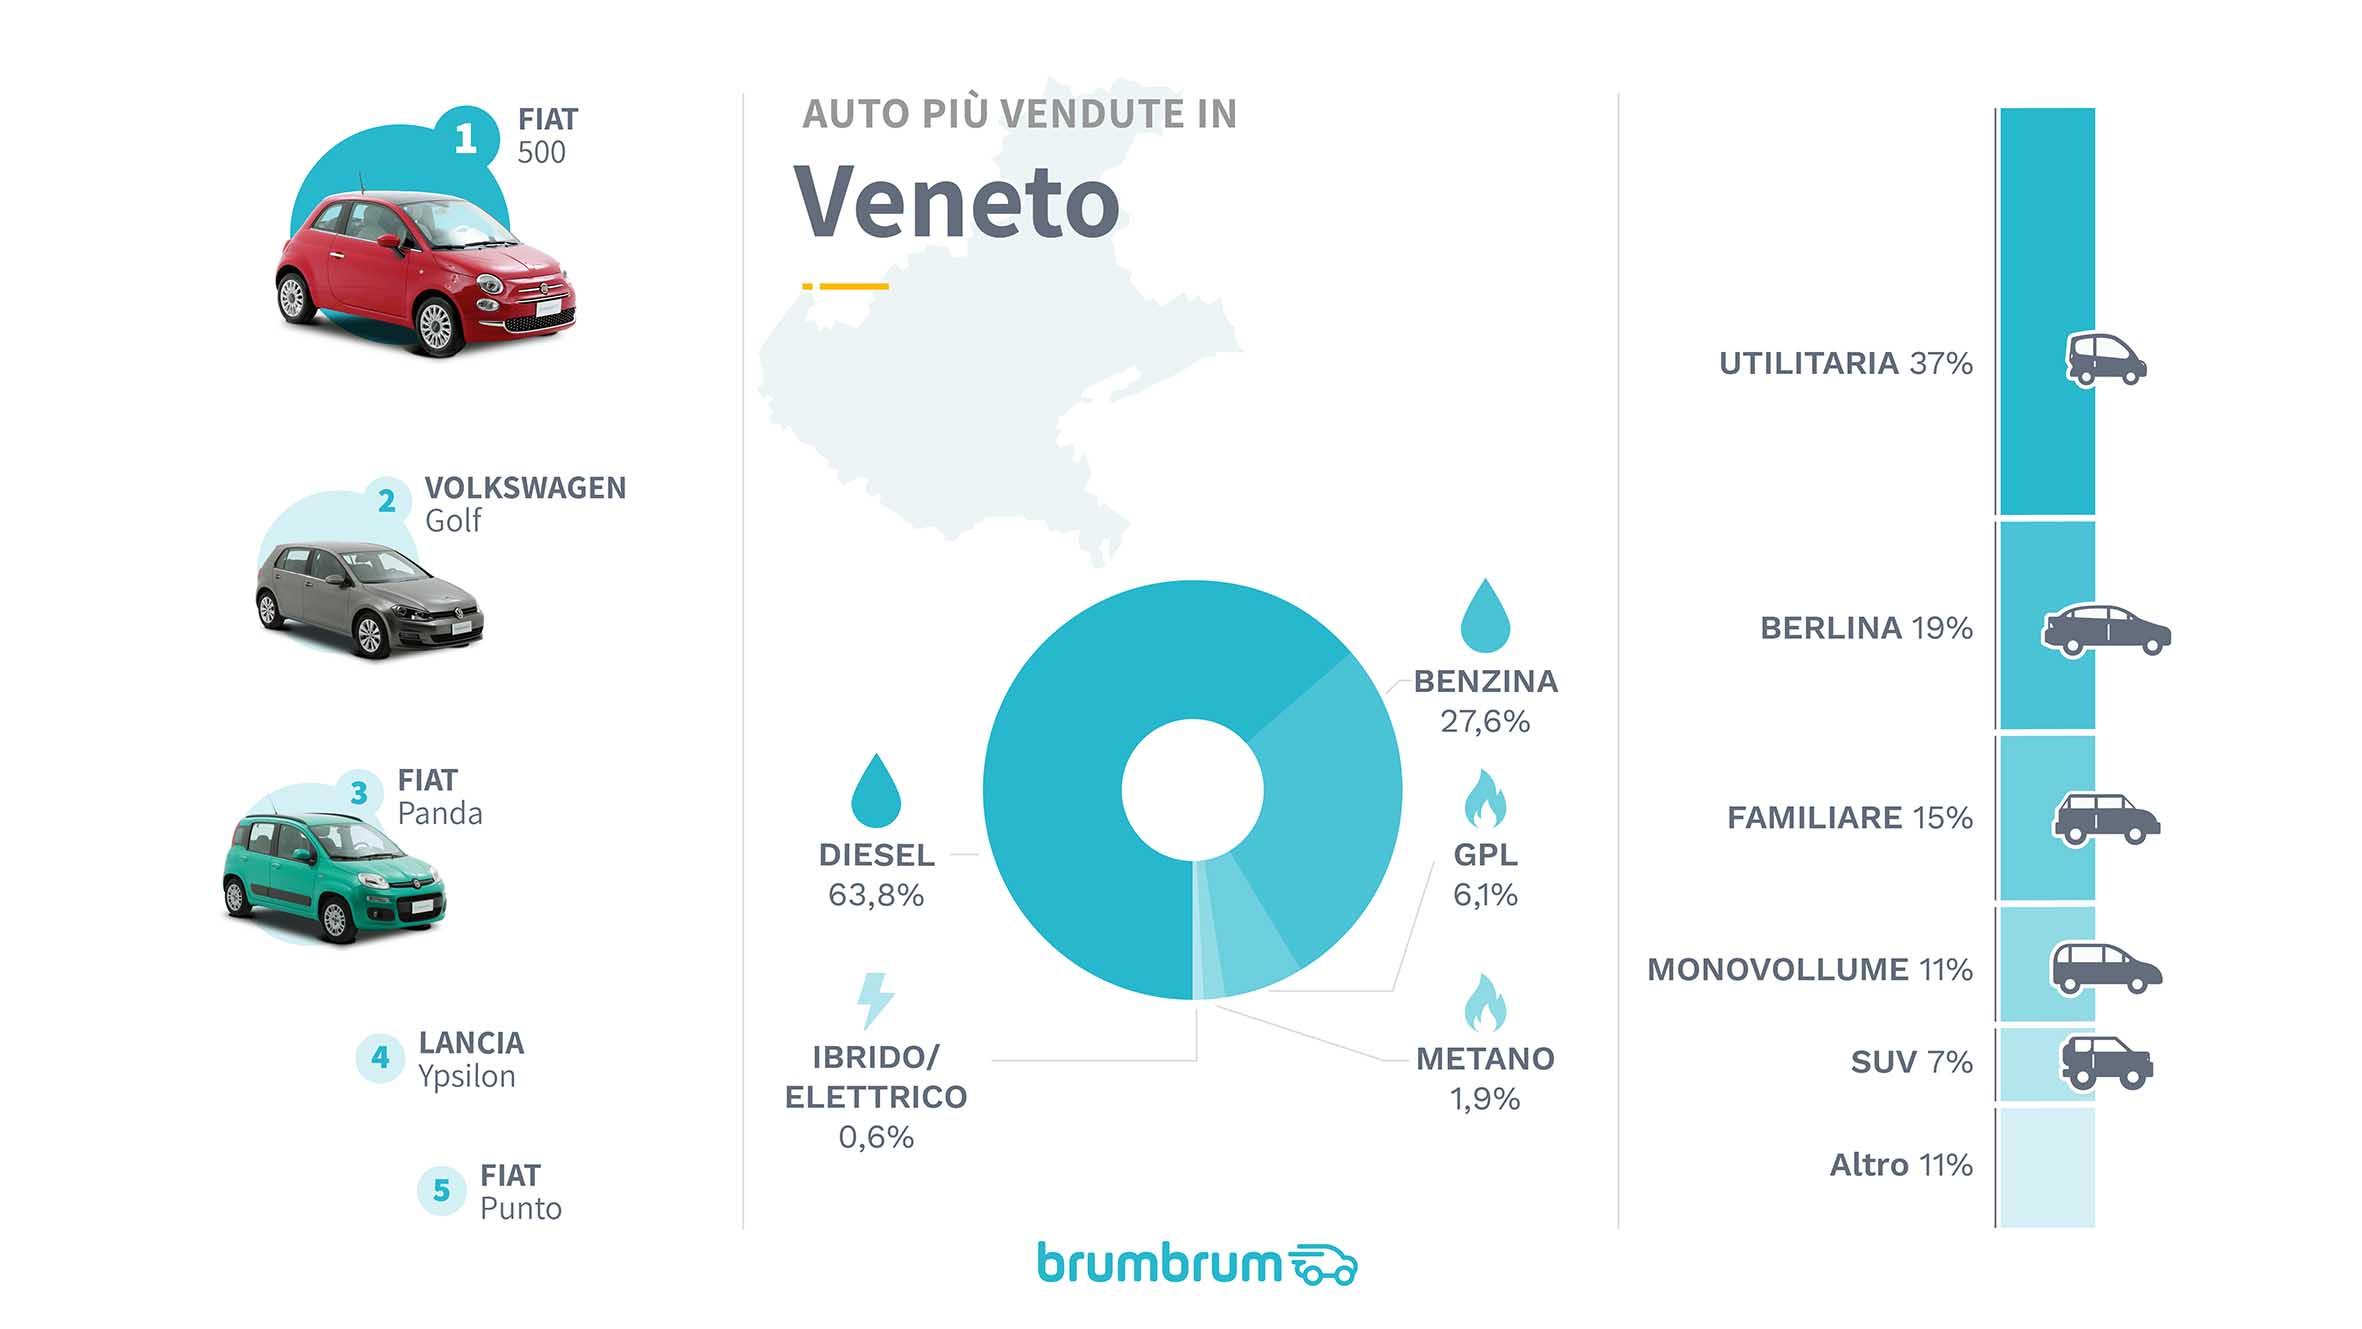 auto più vendute